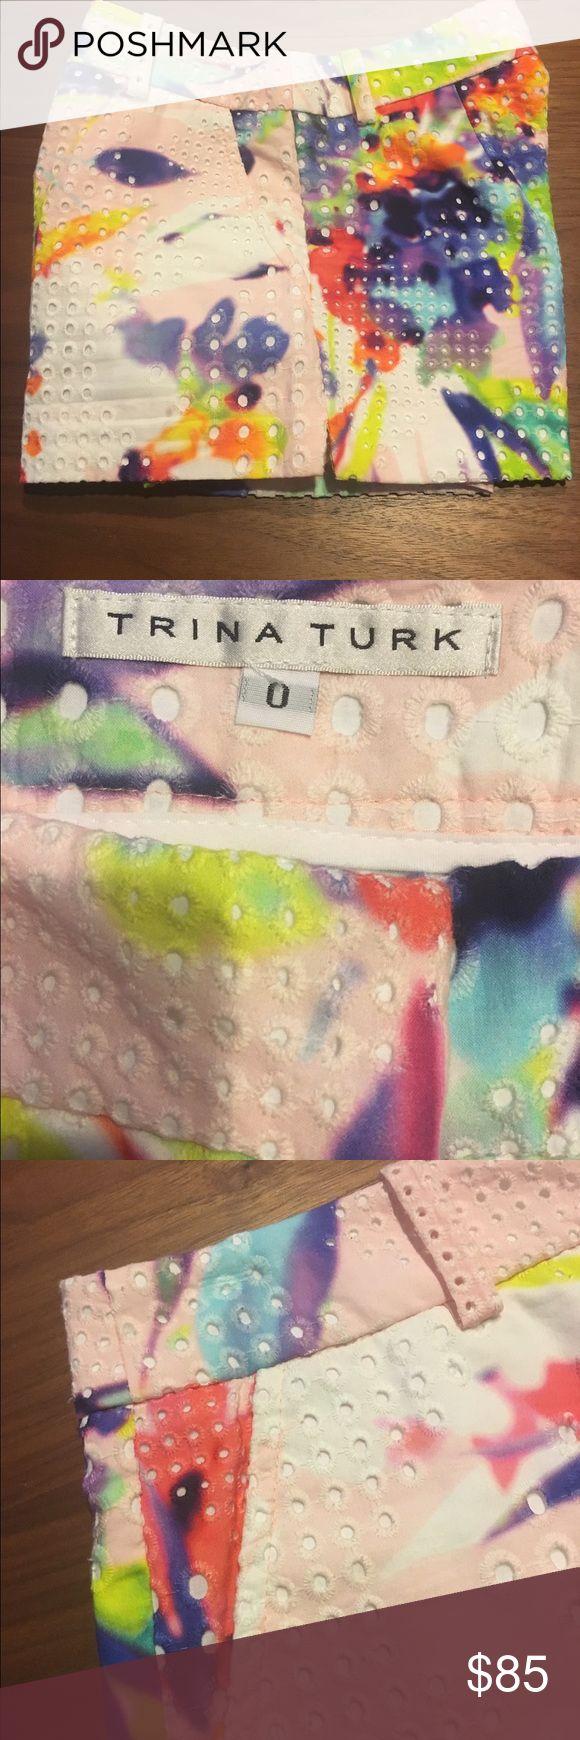 Trina Turk Eyelet Shorts Colorful Trina Turk eyelet shorts with pockets. Worn 1x. Trina Turk Shorts